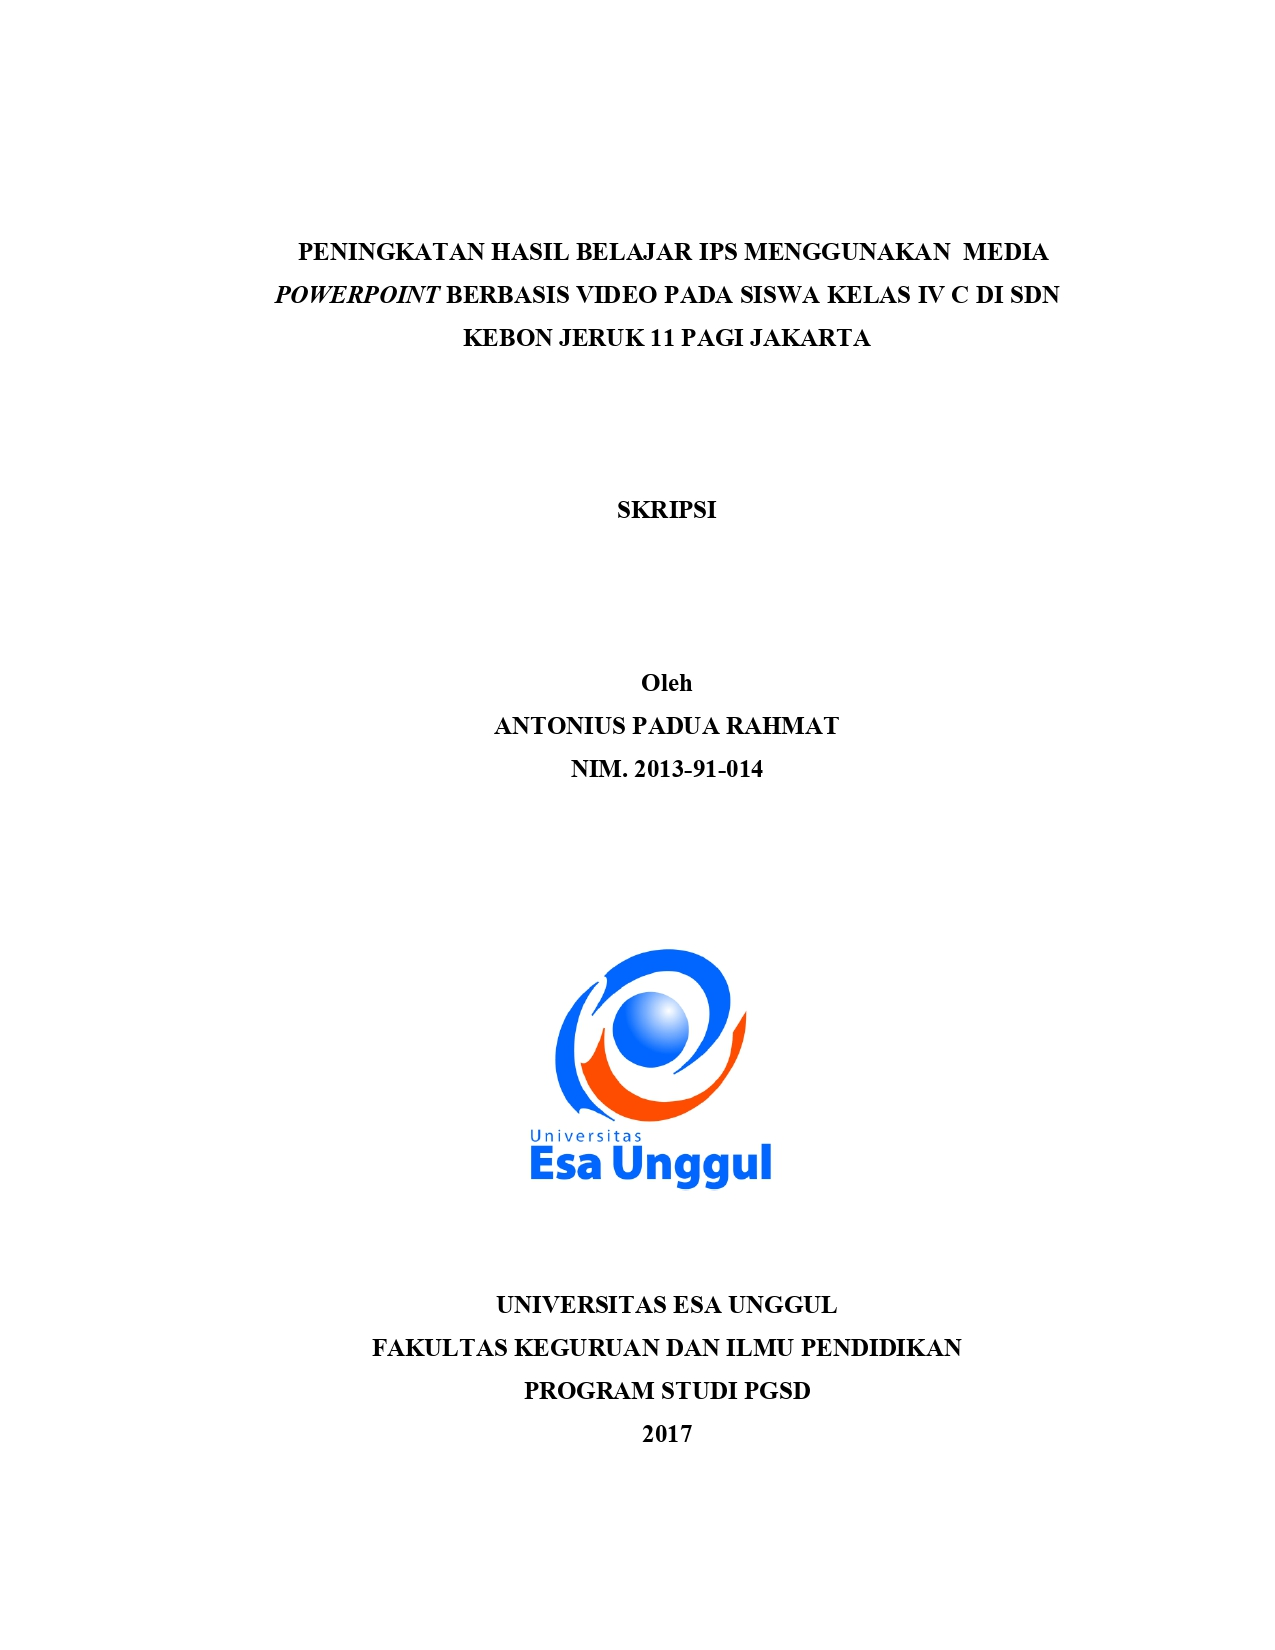 Peningkatan Hasil Belajar Ips menggunakan Media Powerpoint berbasis Video pada Siswa Kelas IV C di SDN Kebon Jeruk 11 Pagi Jakarta